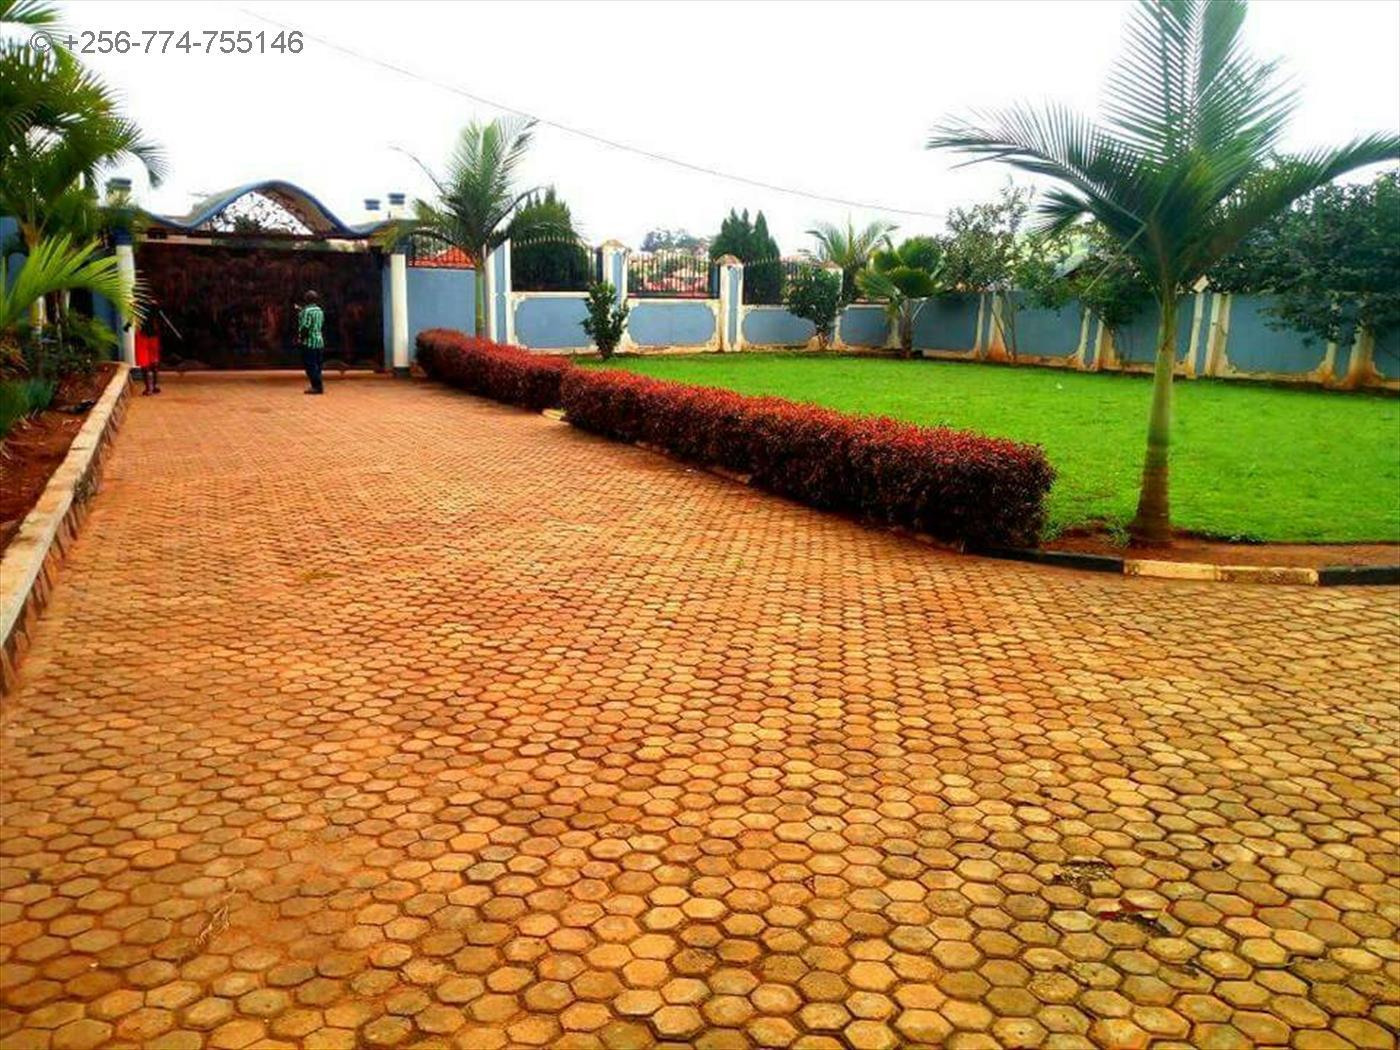 Mansion for sale in Nalumunye Wakiso